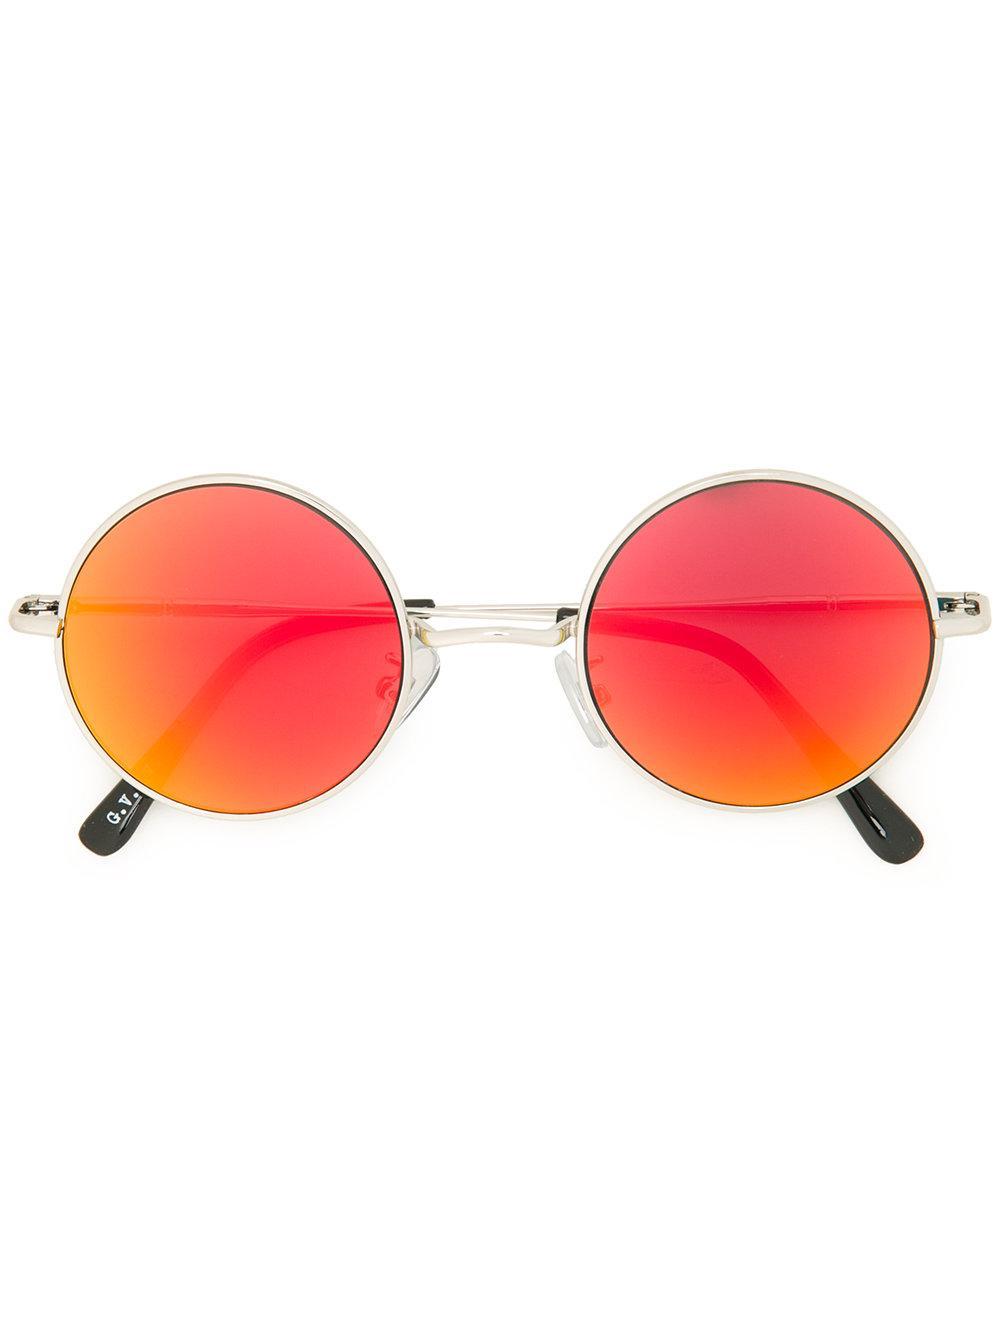 G.v.g.v. Round Frame Sunglasses